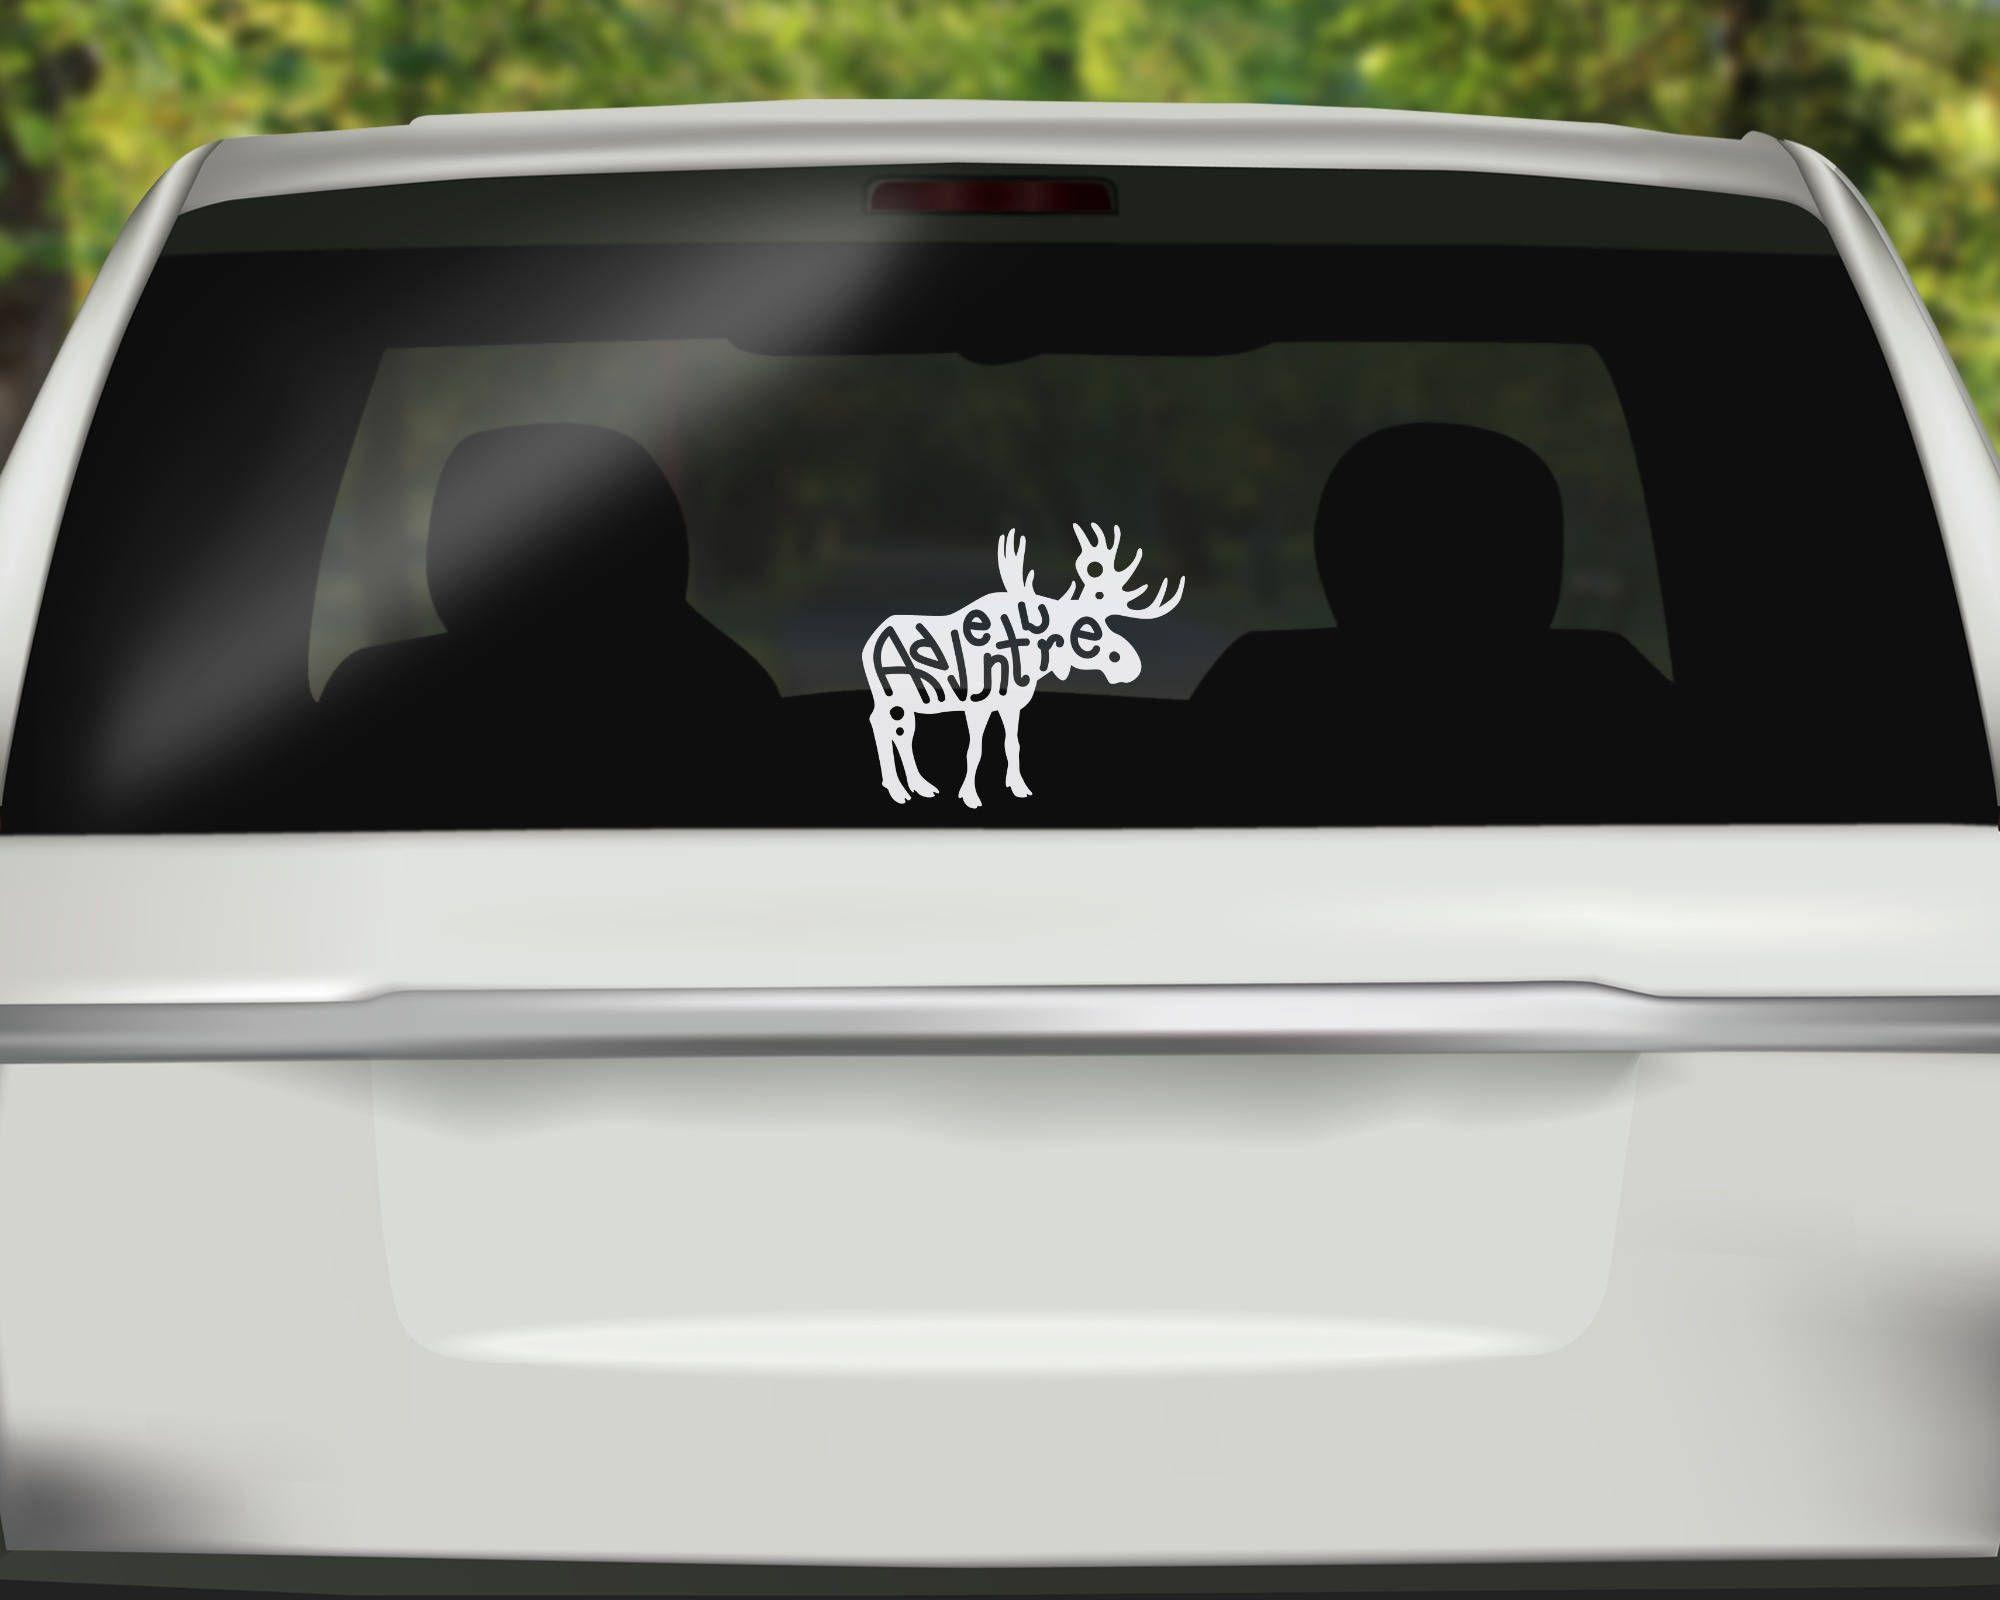 Adventure Moose Decal Moose Car Decal Adventure Alaska Sticker Hand Lettered Sticker Bumper Sticker Funny Car Decals Car Decals Vinyl Hunting Decal [ 1600 x 2000 Pixel ]